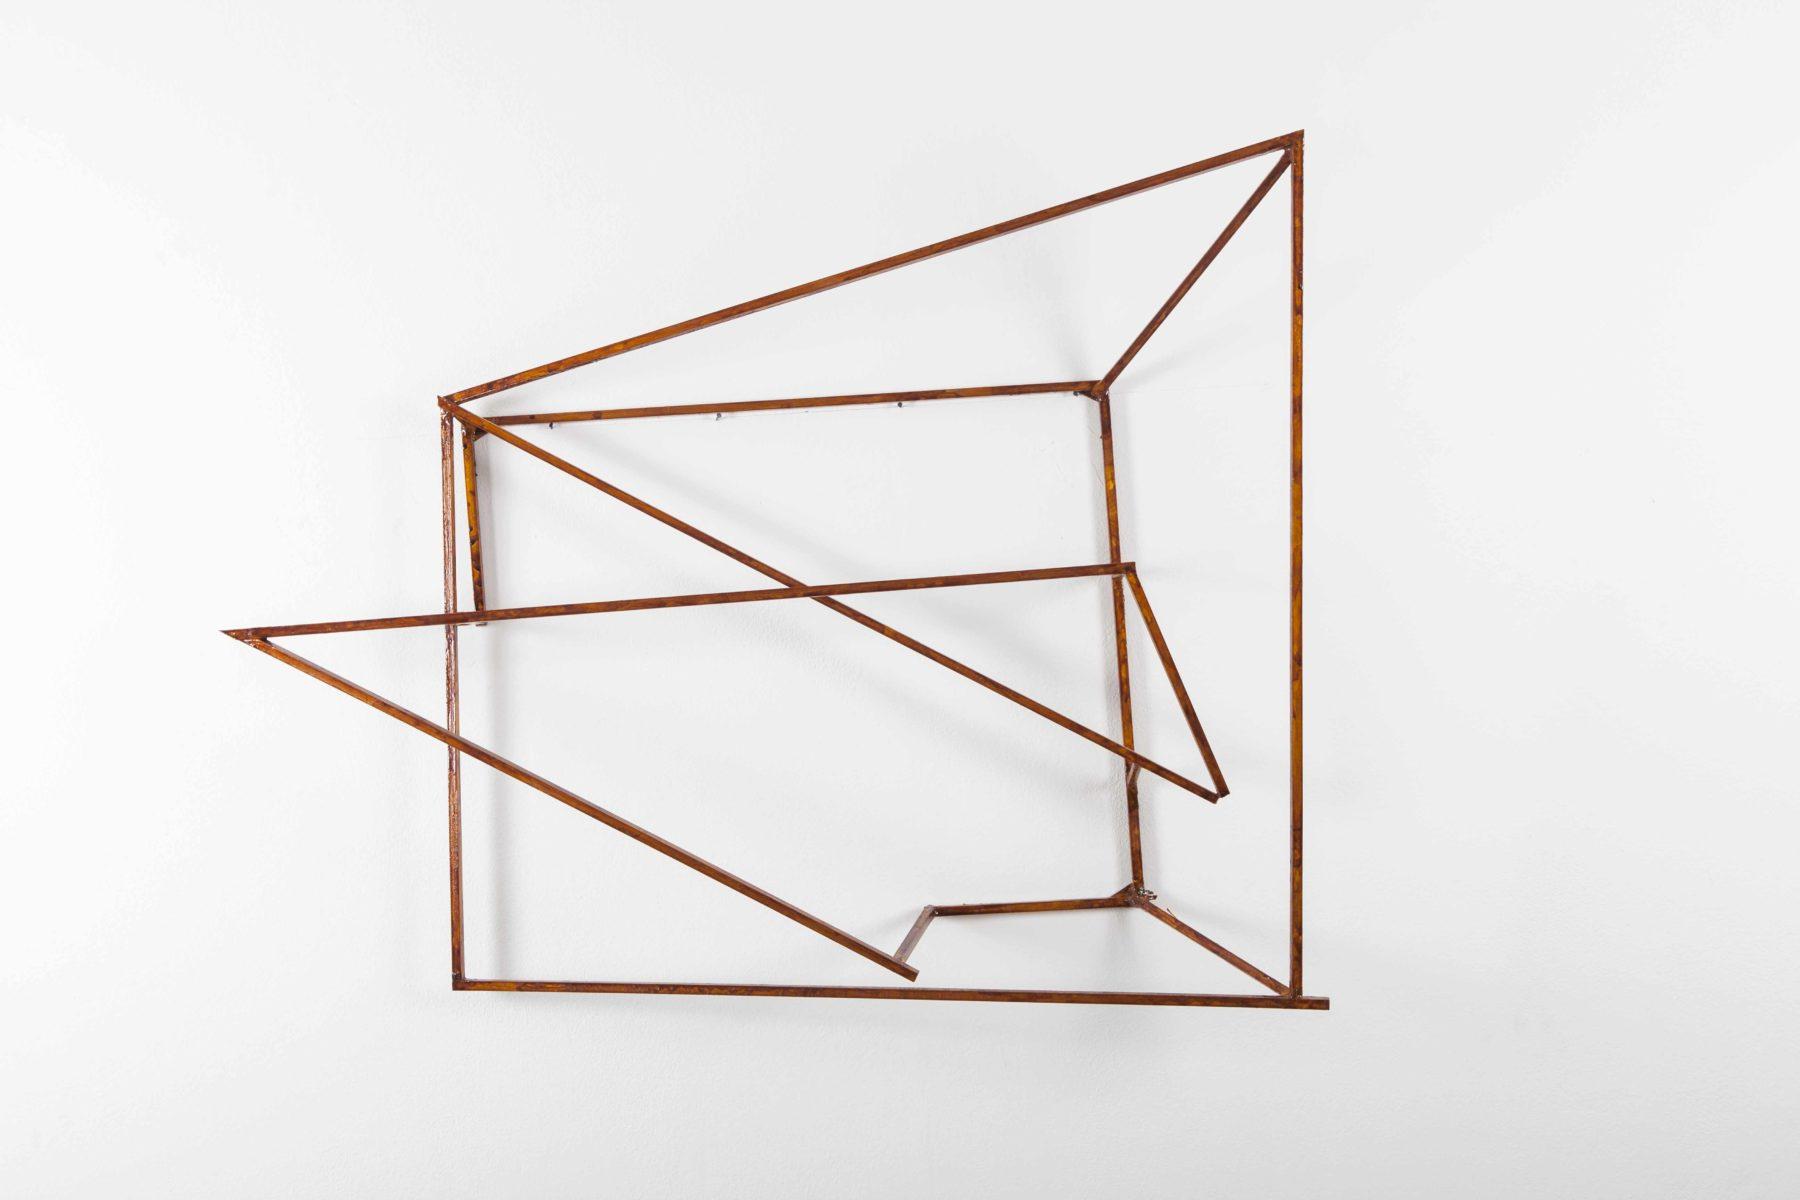 9. Max Frintrop sculture1 Untitled 110x85x27cm - 2012